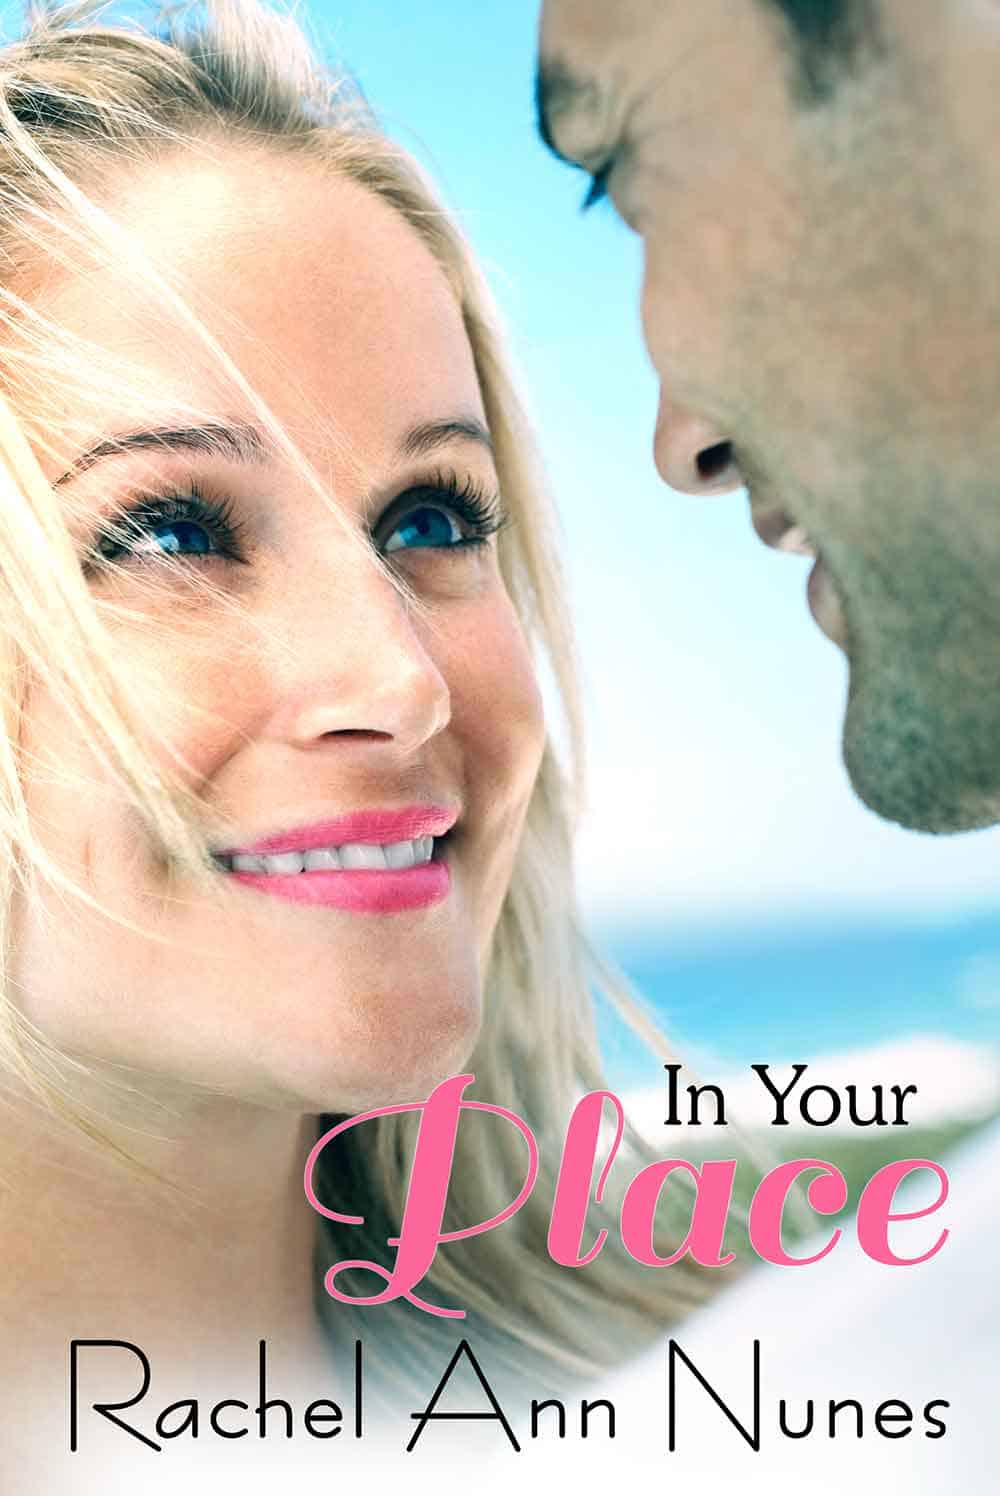 In Your Place by Rachel Ann Nunes